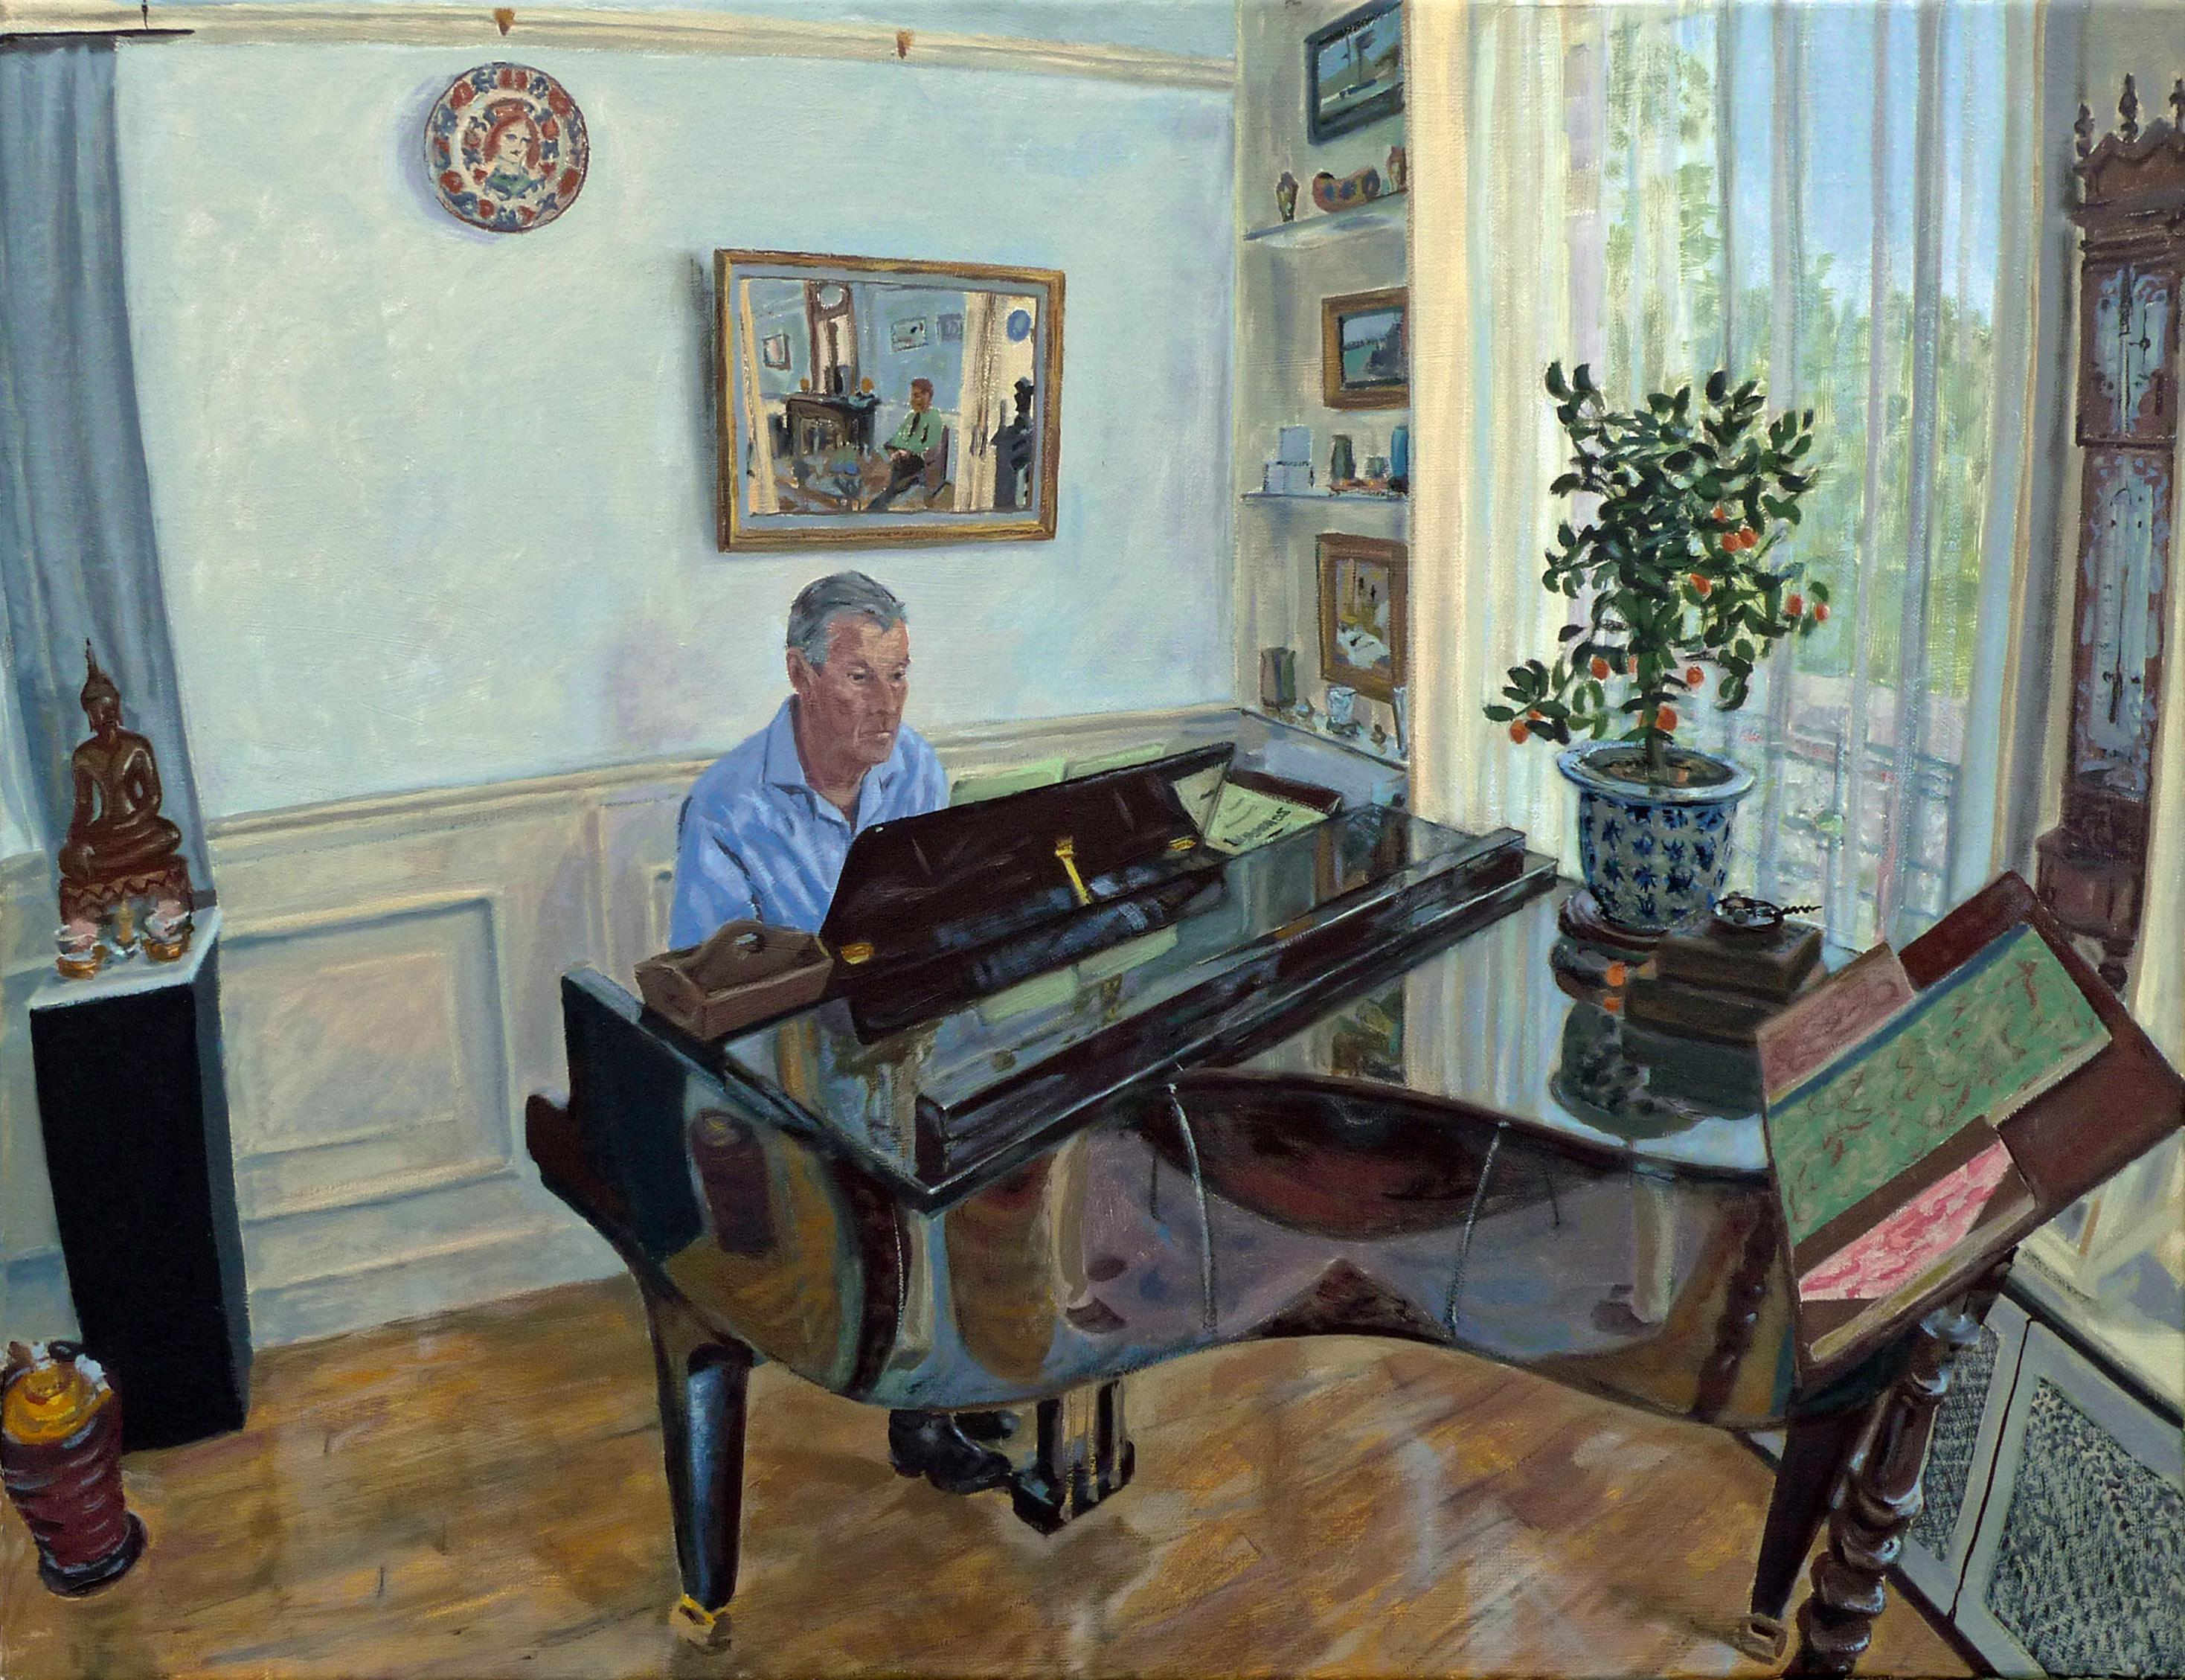 In opdracht Ton, 2010, 50x65